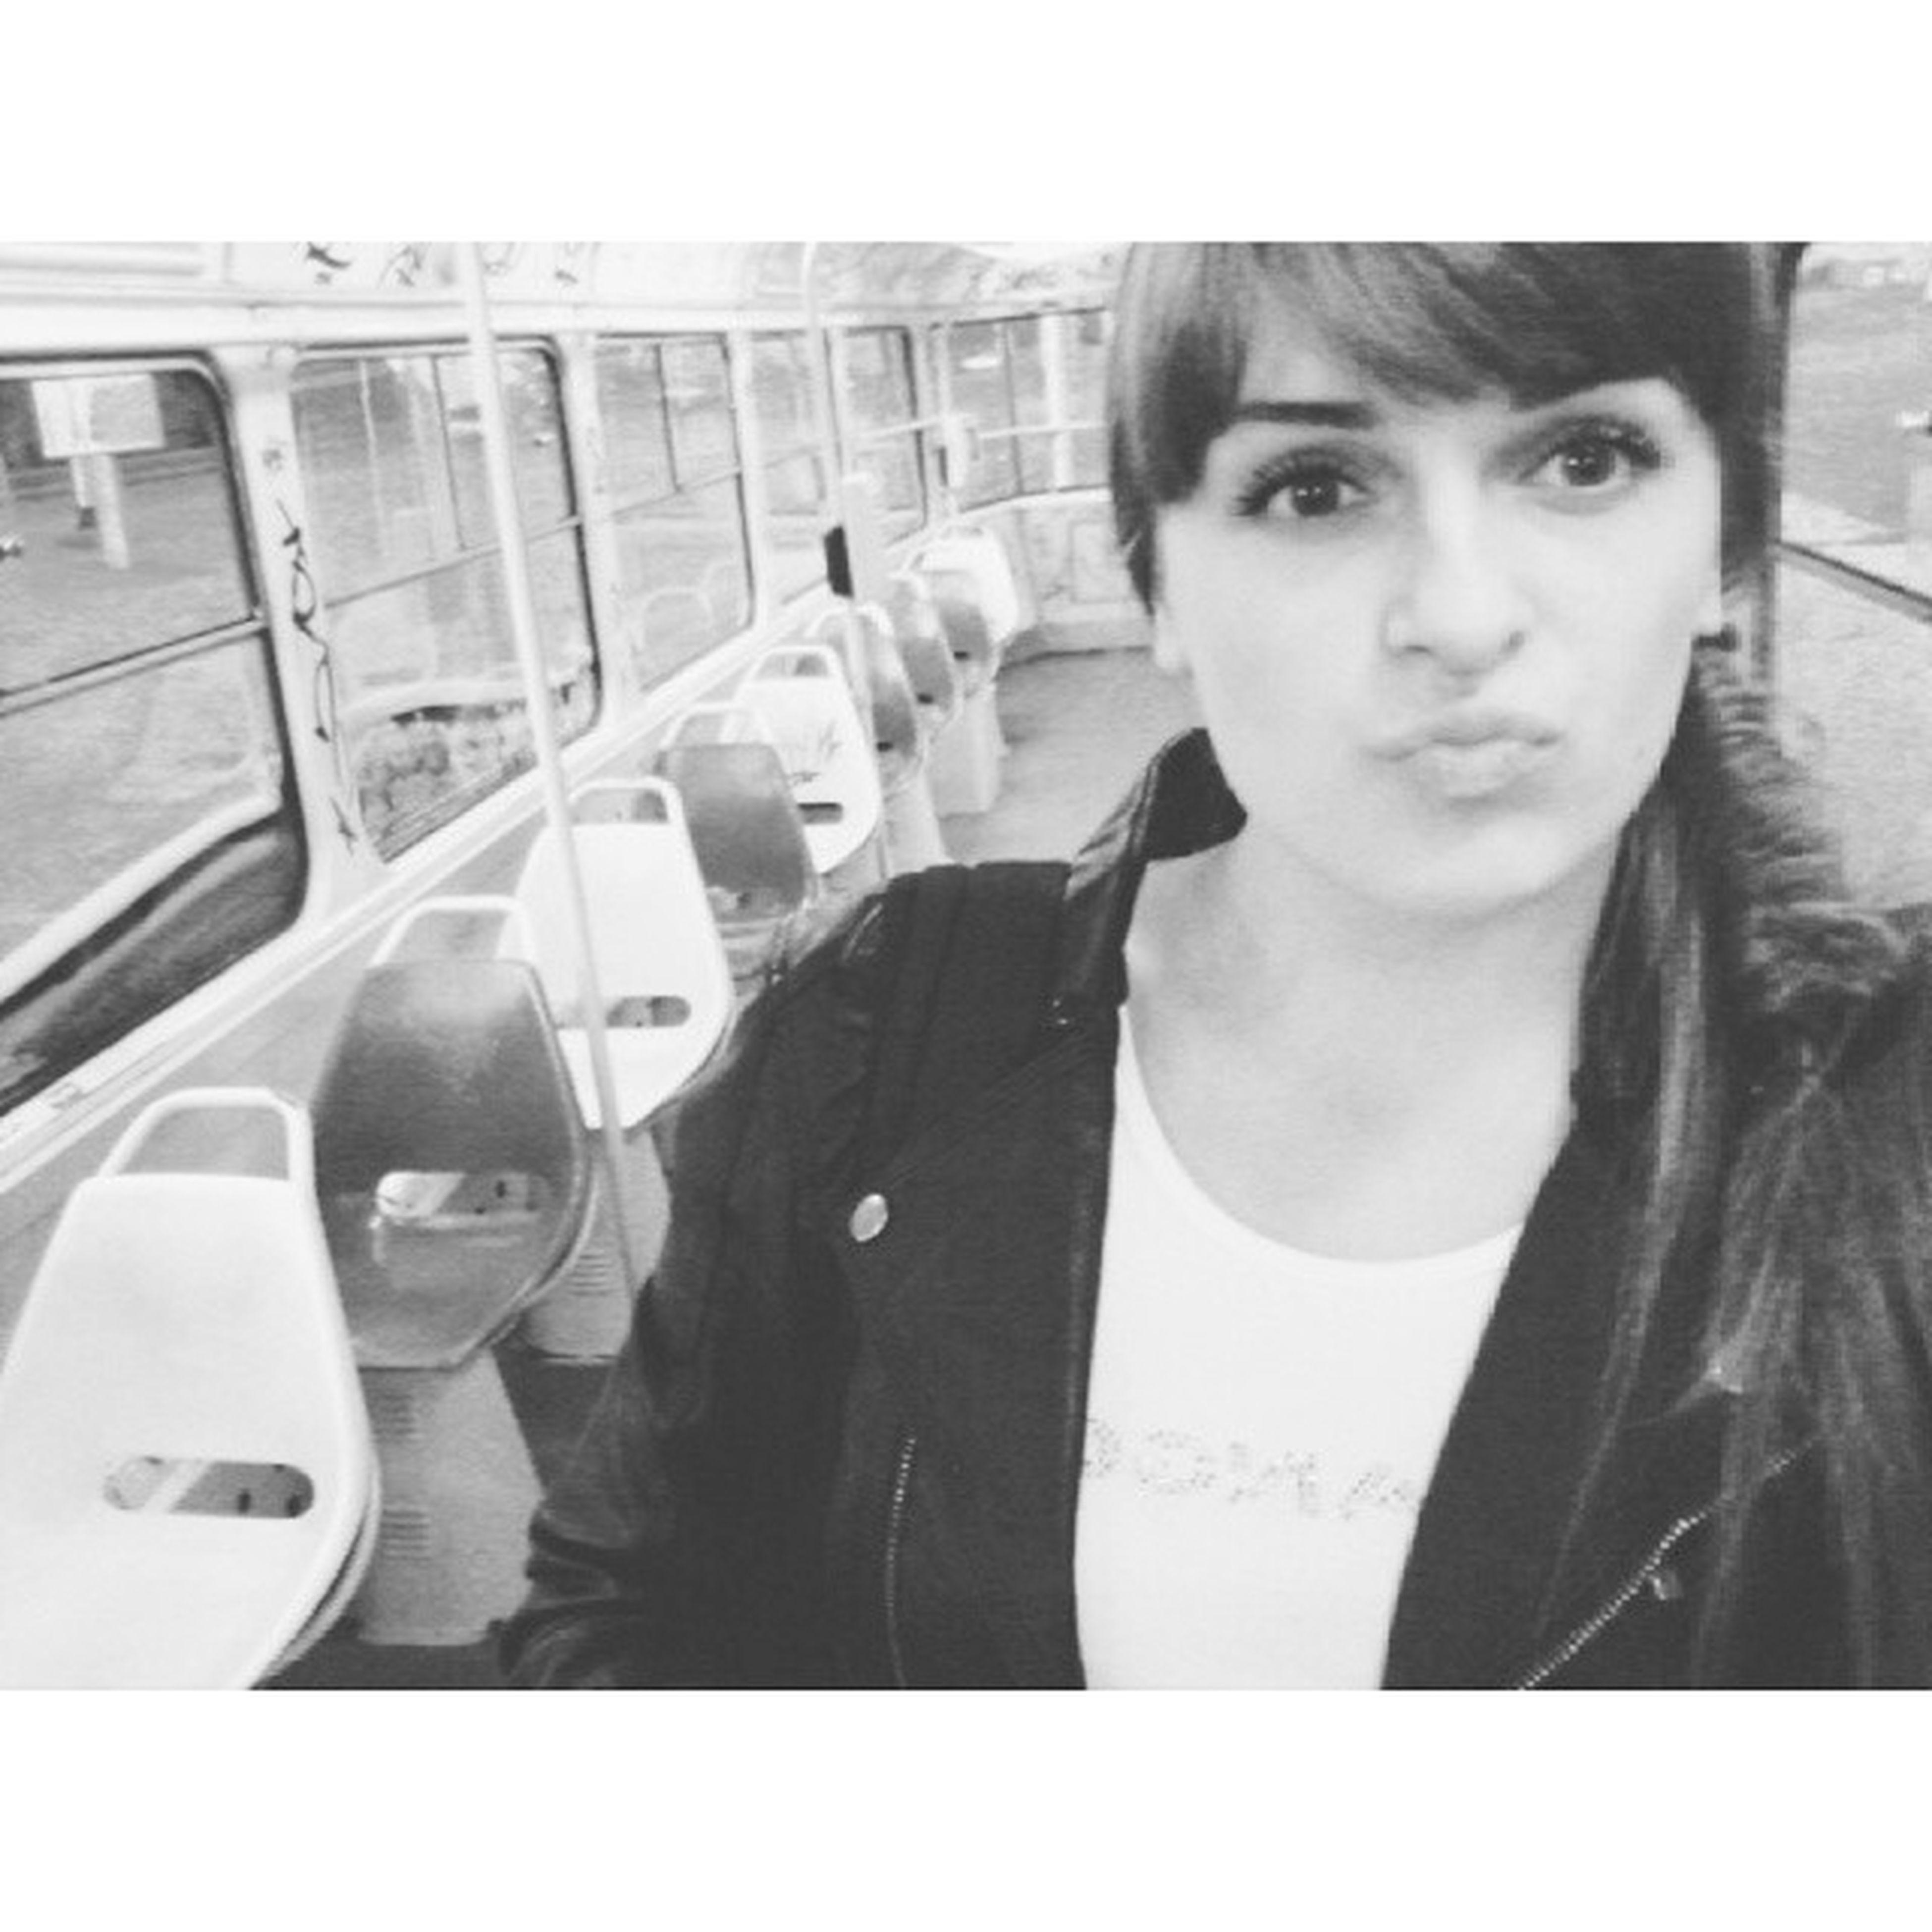 Prazna sedmica :) Selfie Iz Trajvana Boleest after school partiono lol dakfejs ahaha ajmemenejoj hola